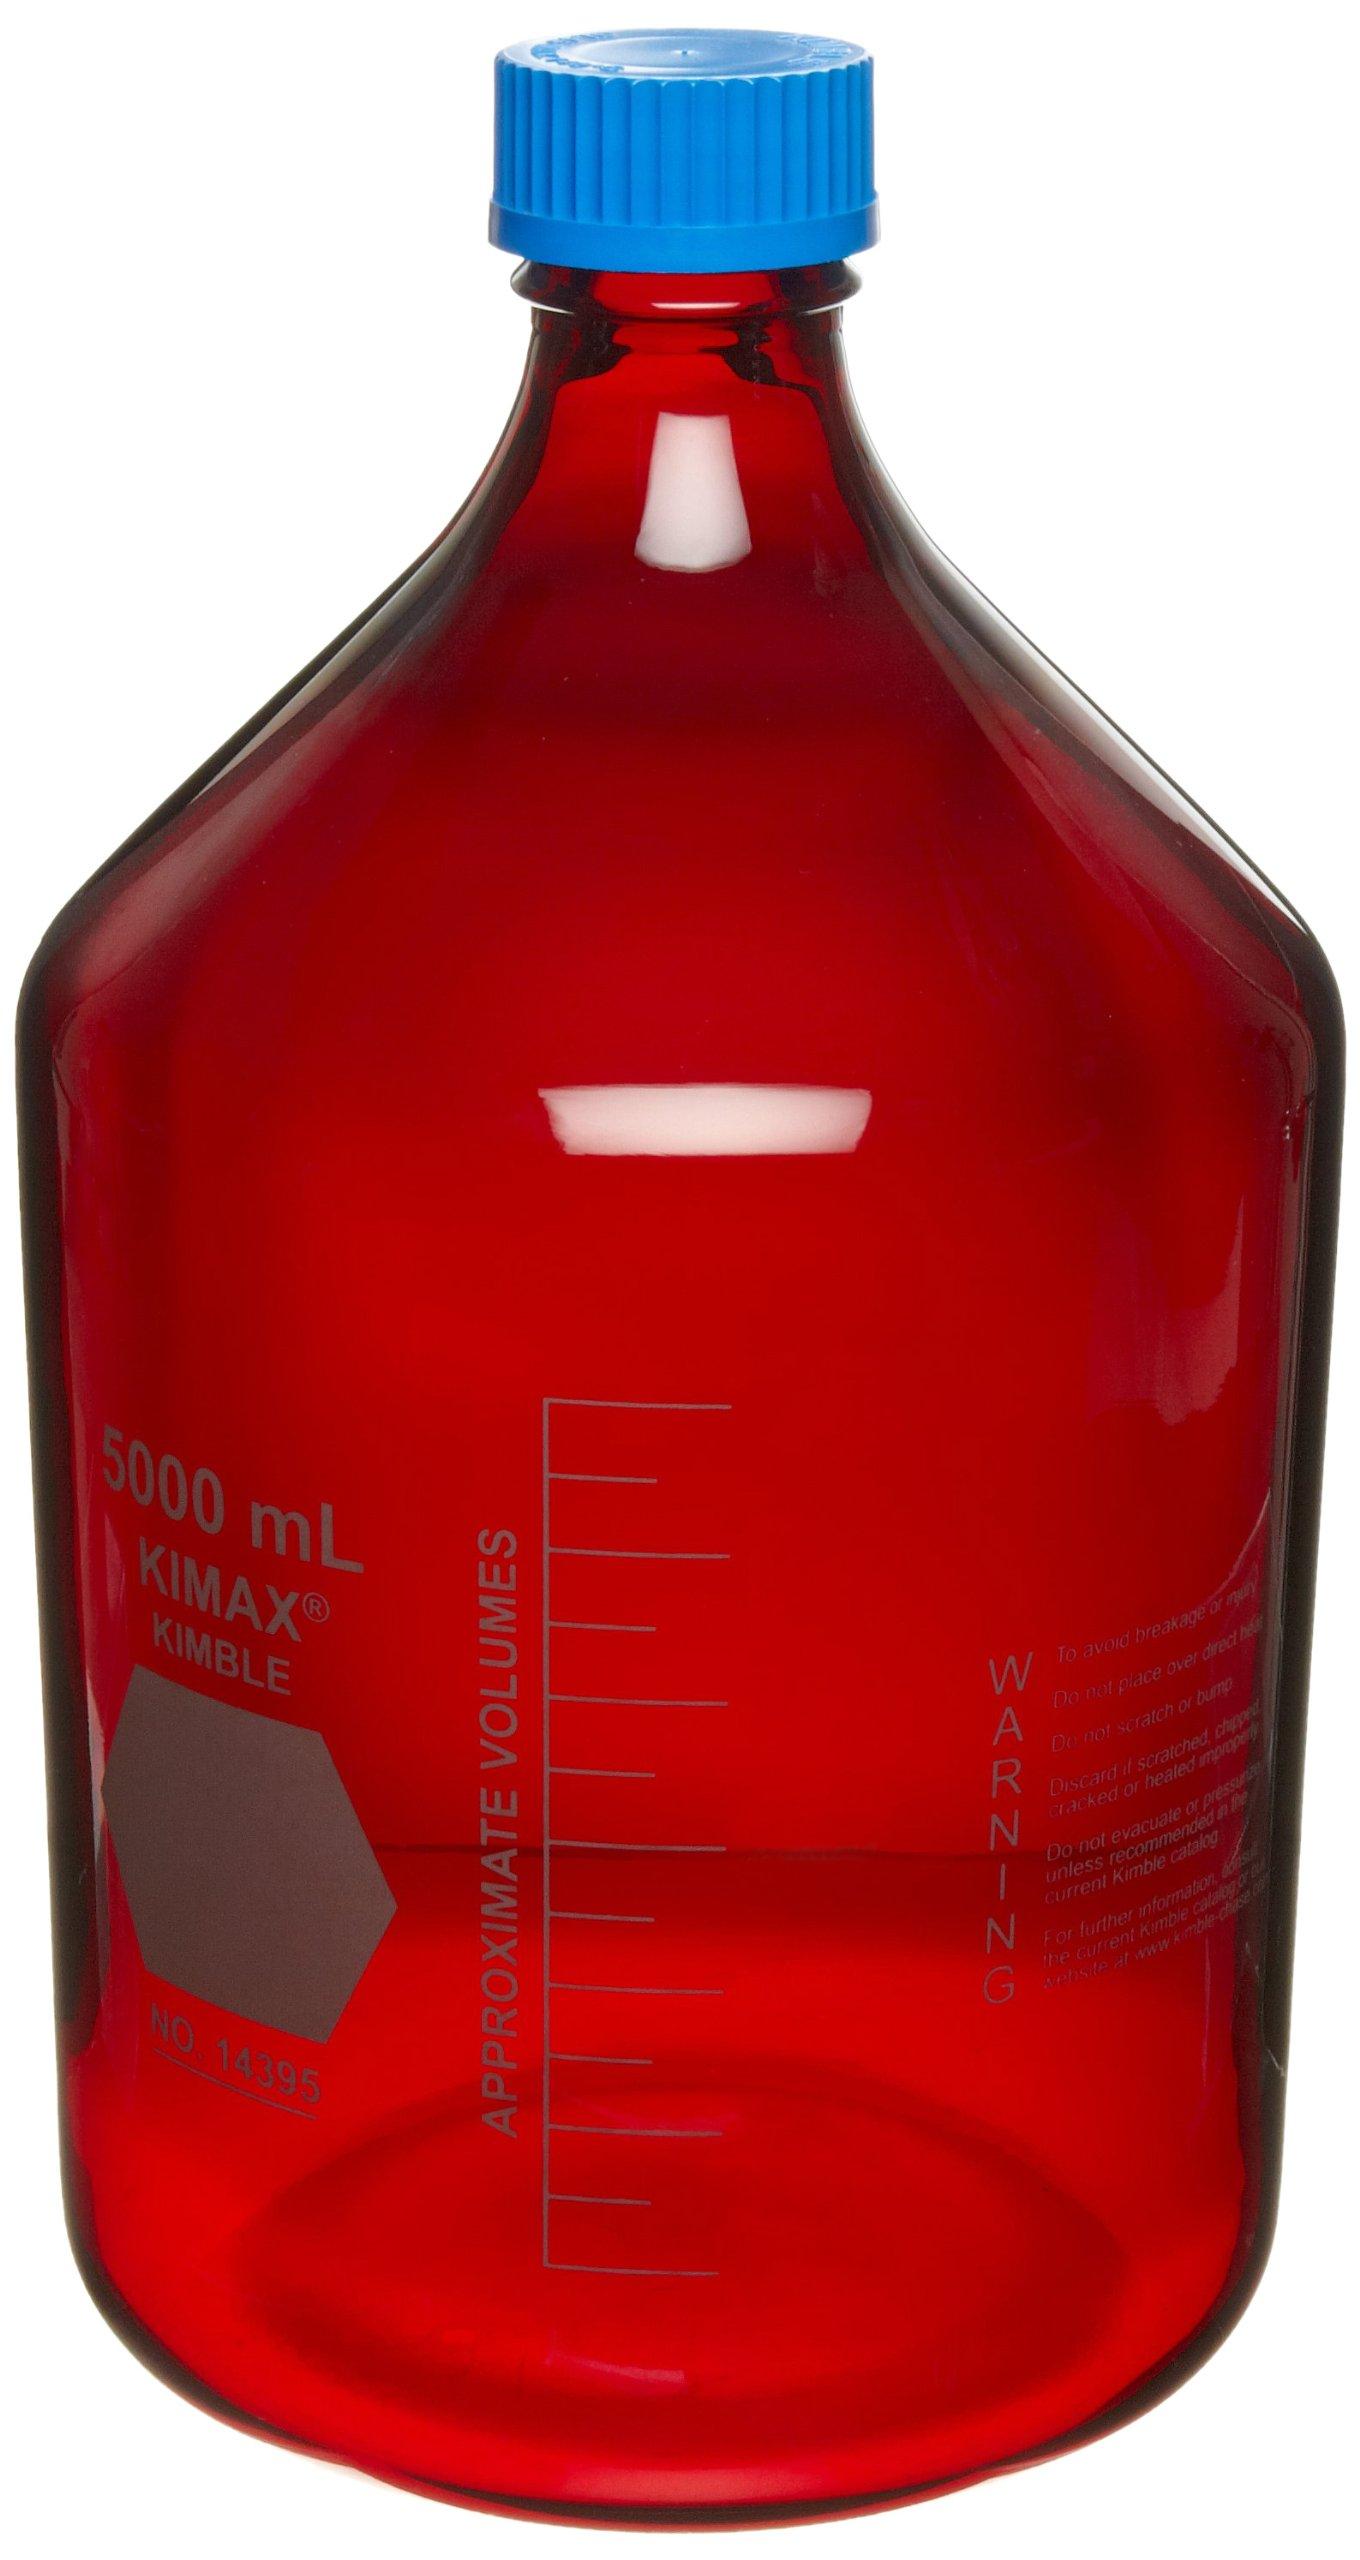 Kimble RAY-SORB 14399-1000 Borosilicate Glass Graduated GL-45 Media/Storage Bottle With Blue Polypropylene Cap, 1 L Capacity